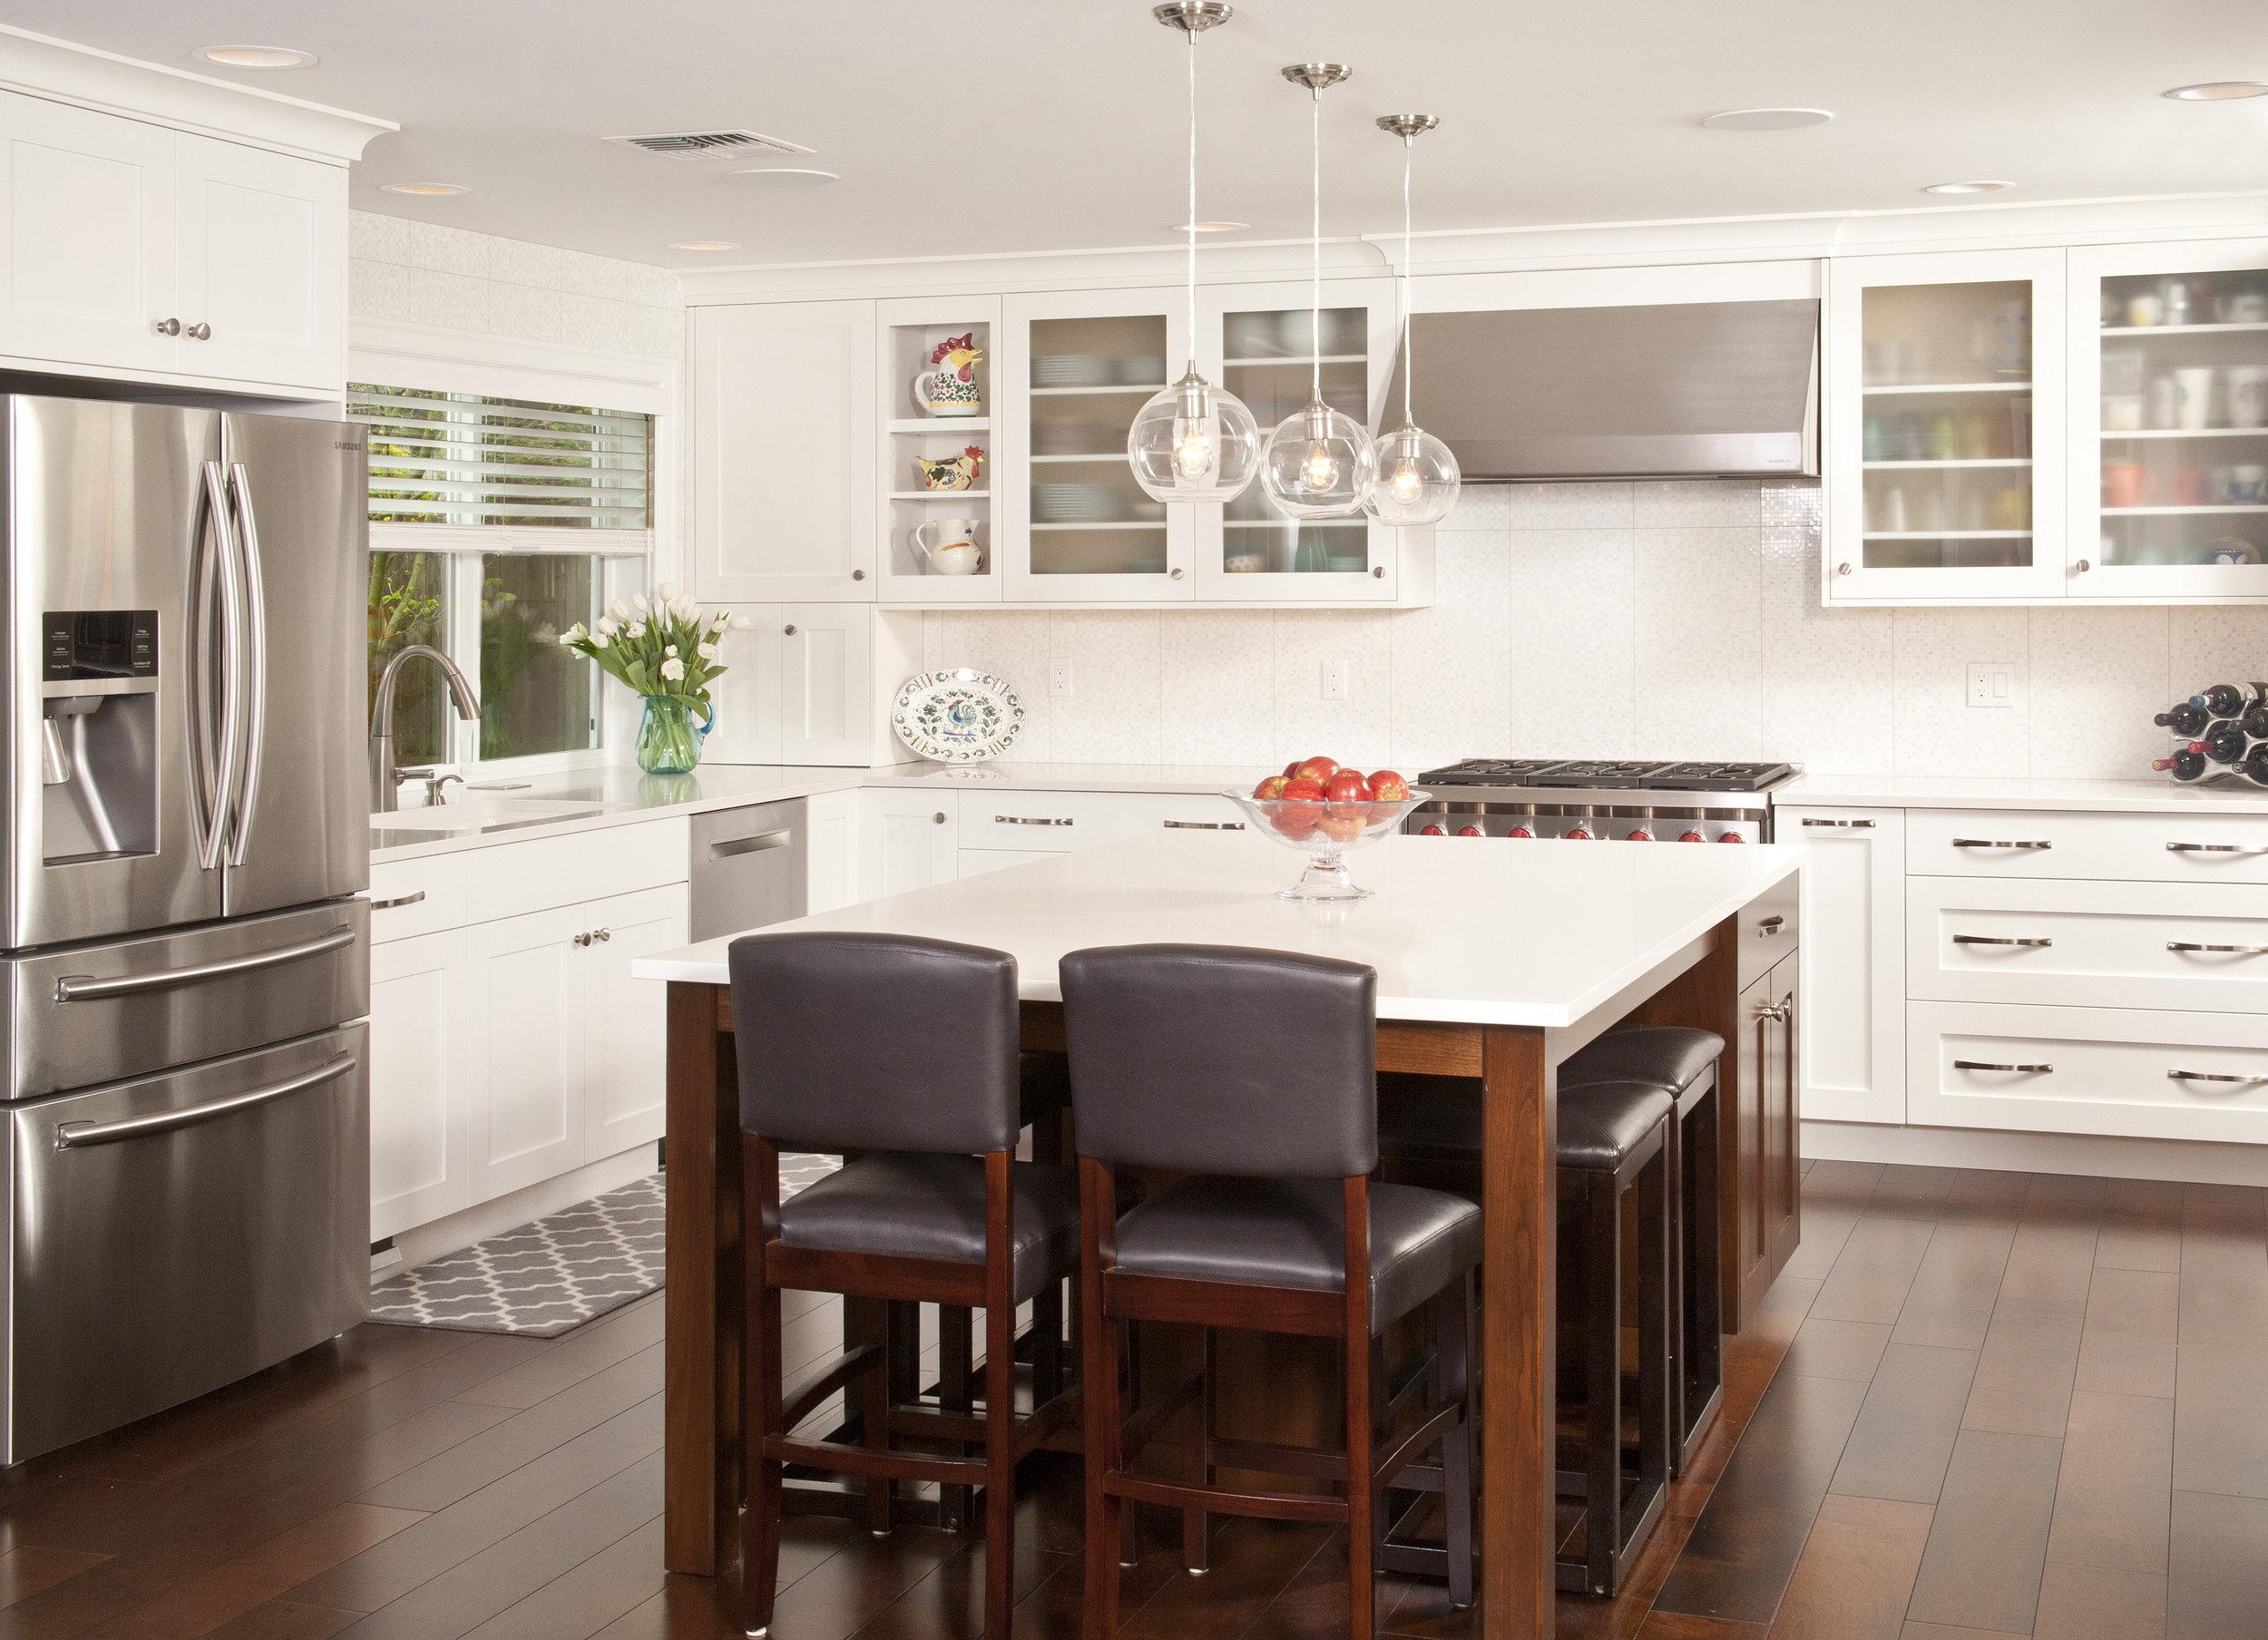 Bellevue Newport Shores Transitional Kitchen 1.jpg